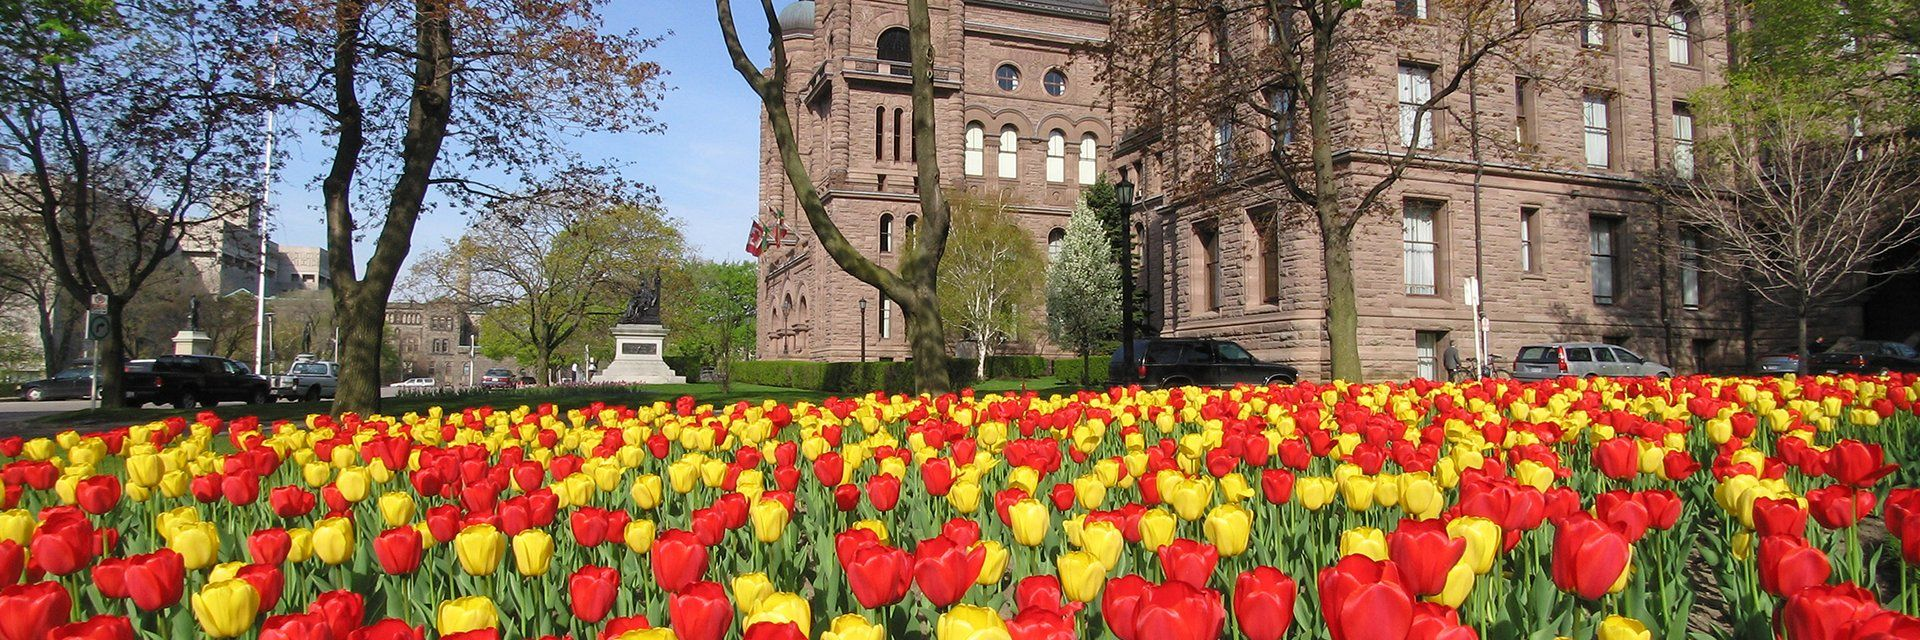 Festival canadien des tulipes à Ottawa